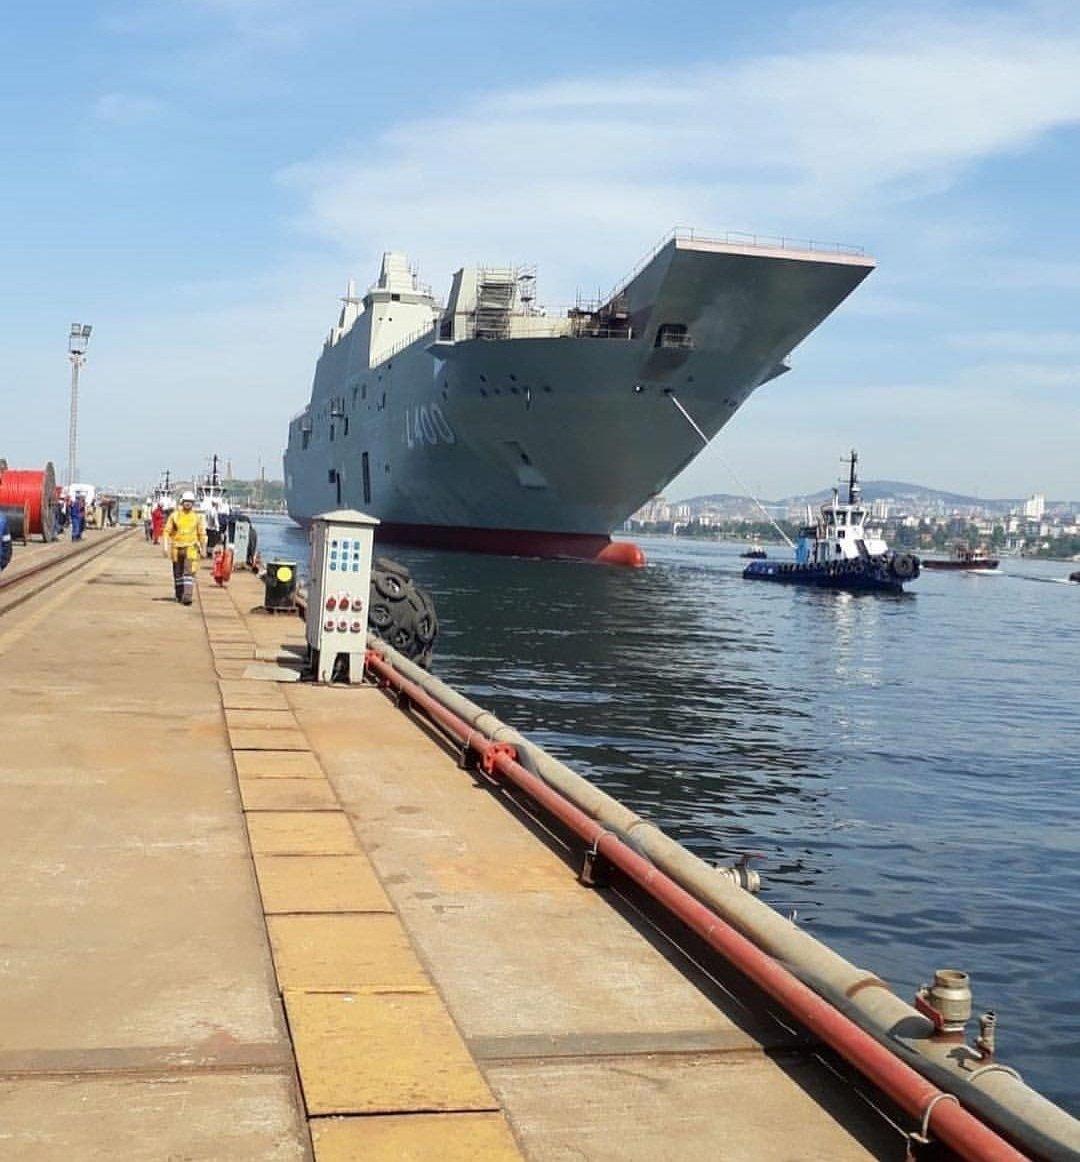 Turkey Floats Its Indigenous Amphibious Landing Ship TCG Anadolu L400